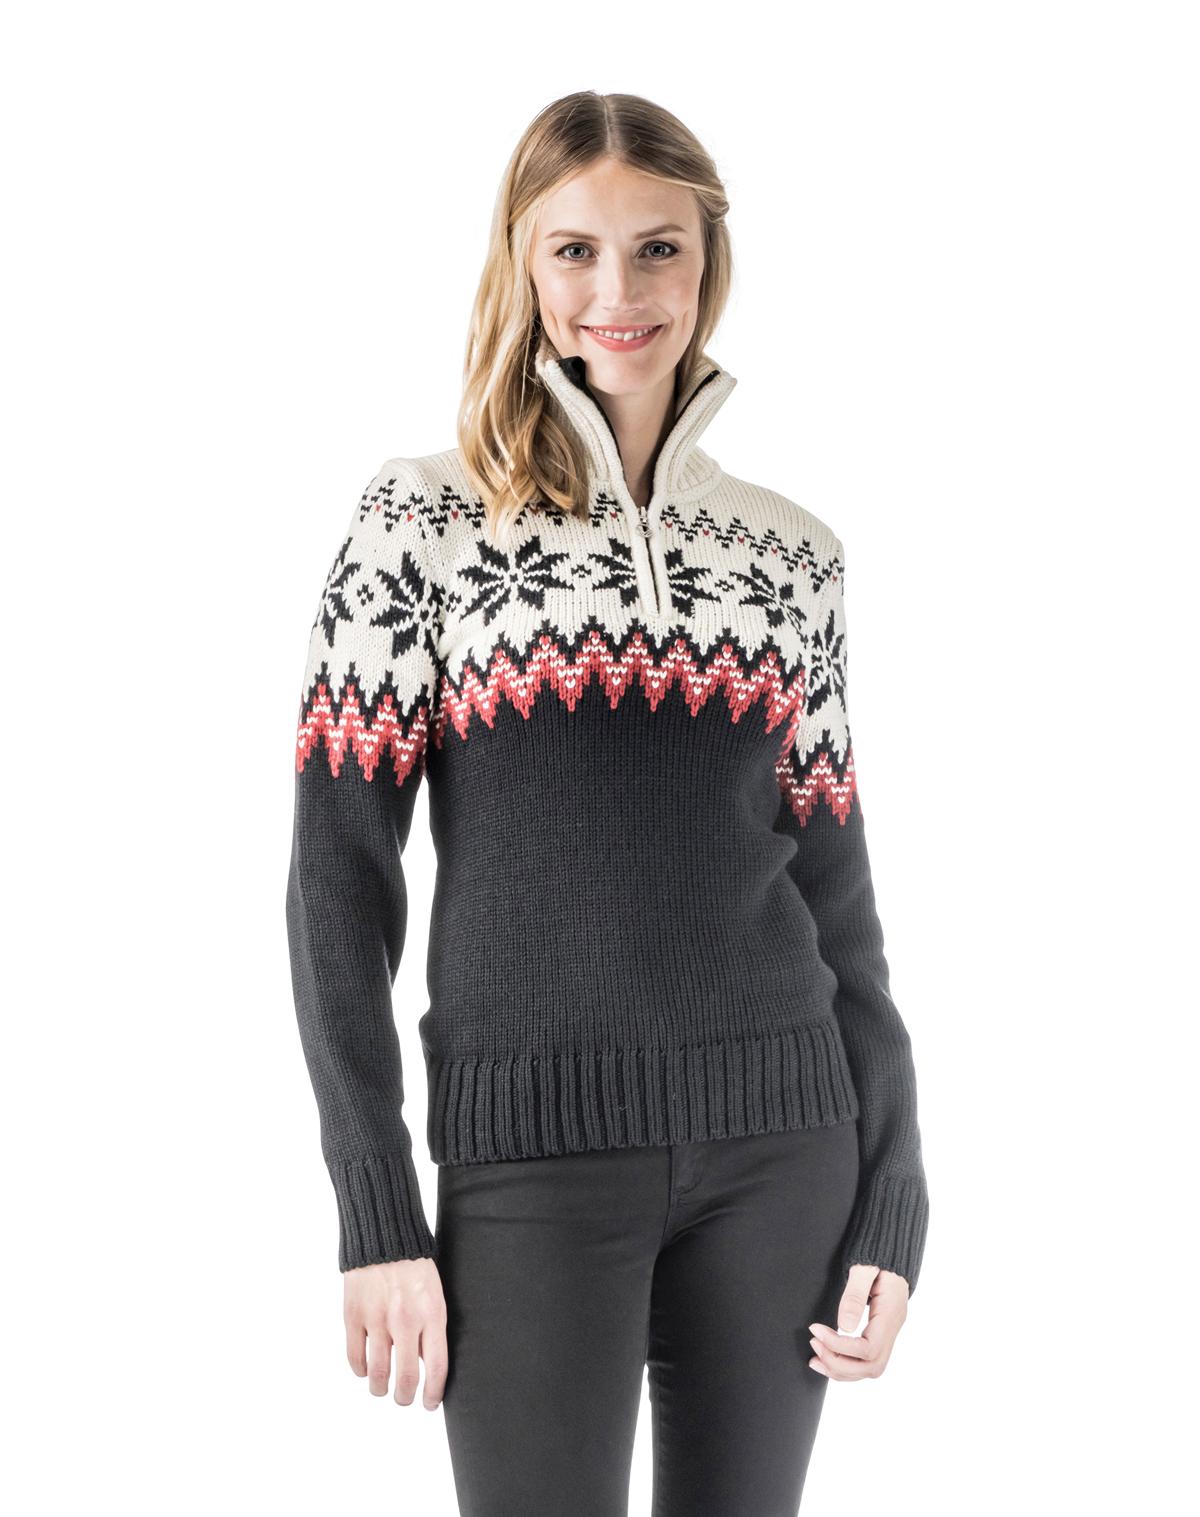 Myking Feminine Sweater